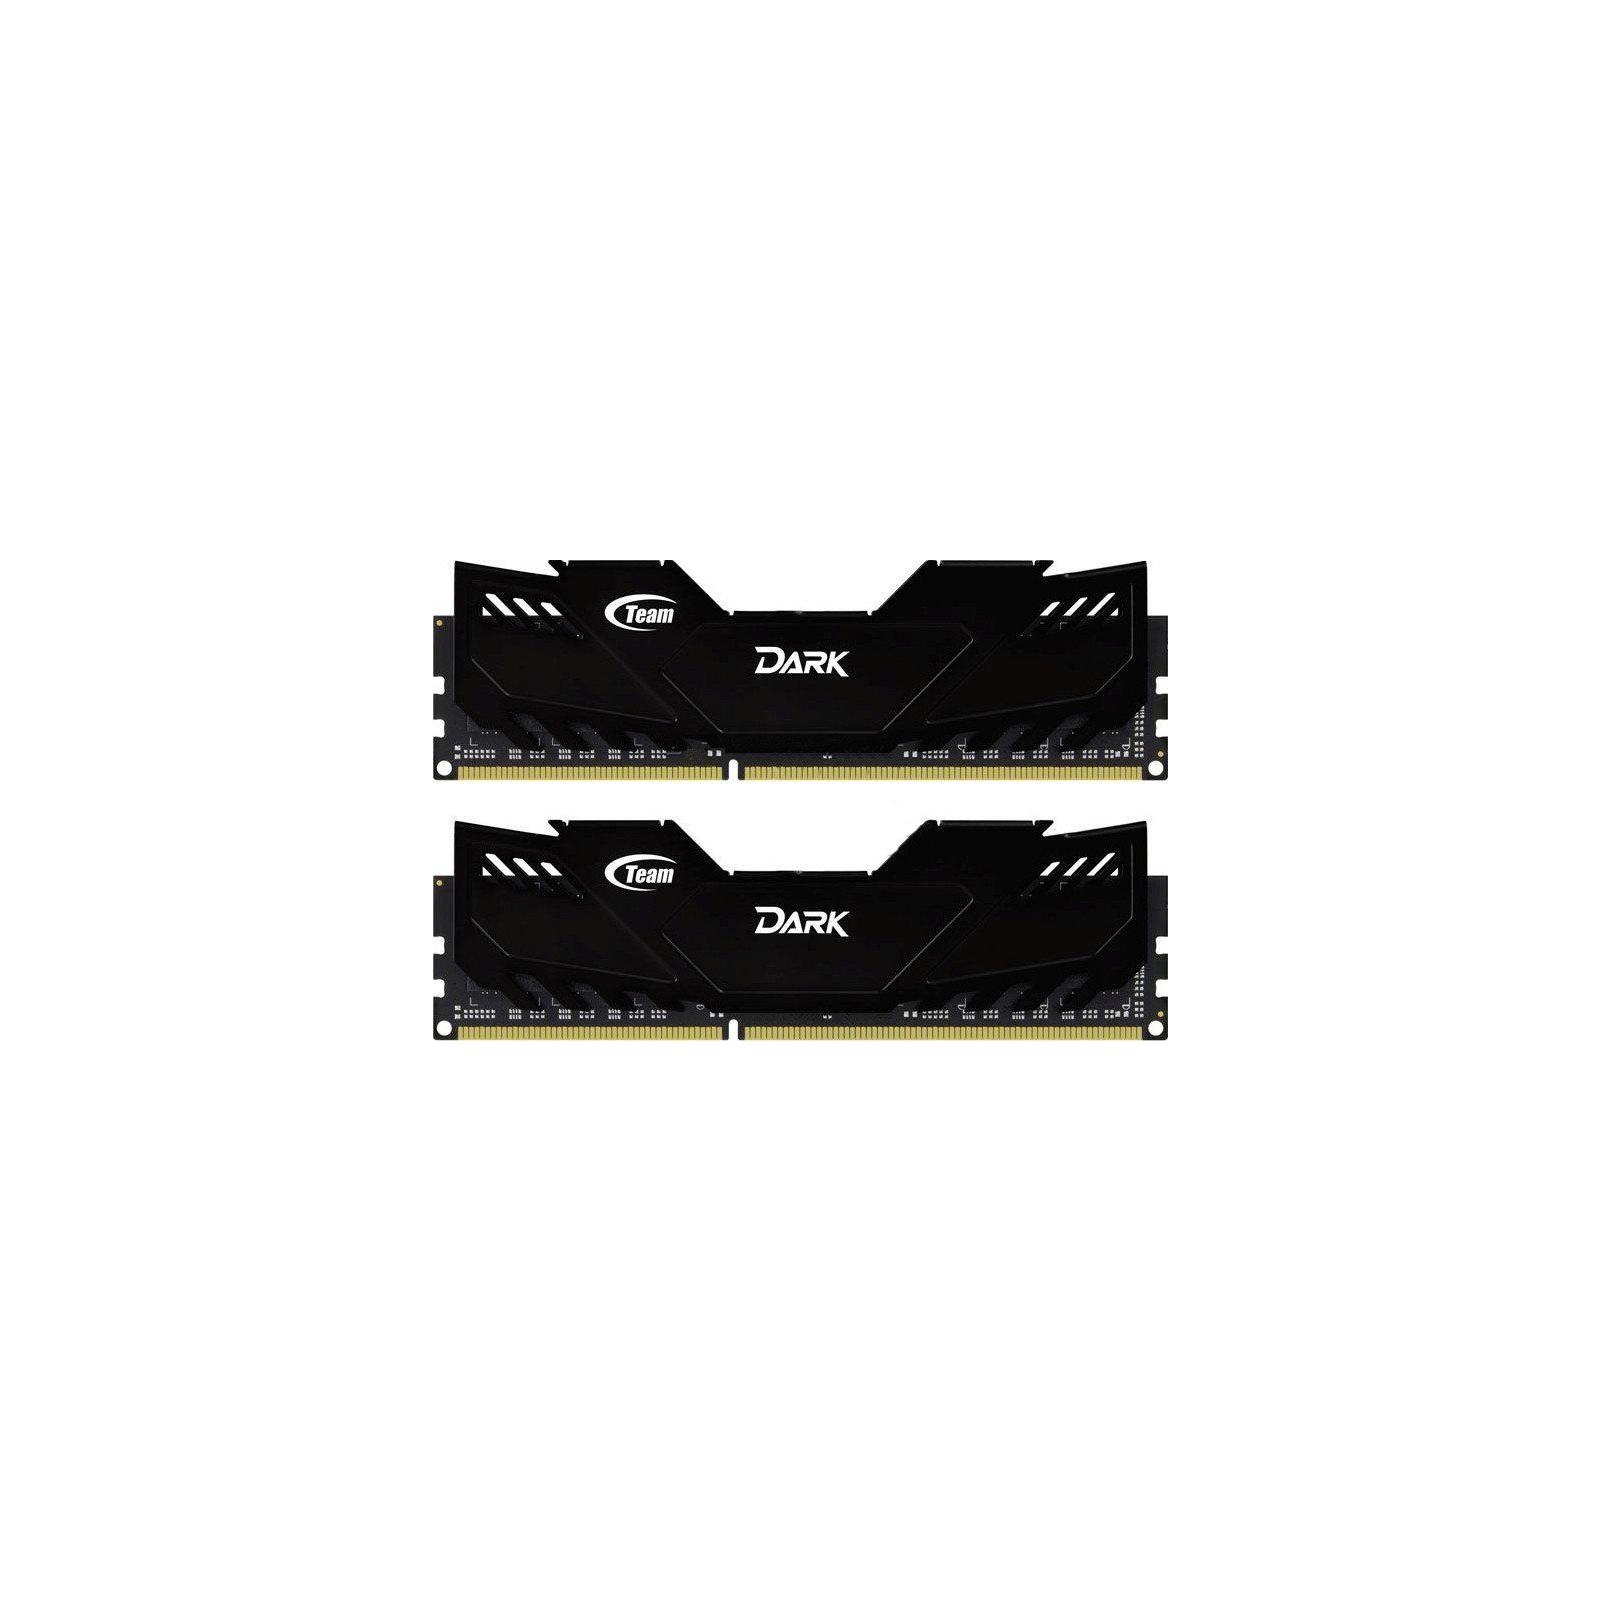 Модуль памяти для компьютера DDR4 16GB (2x8GB) 3000 MHz Dark Black Team (TDKED416G3000HC15ADC01)